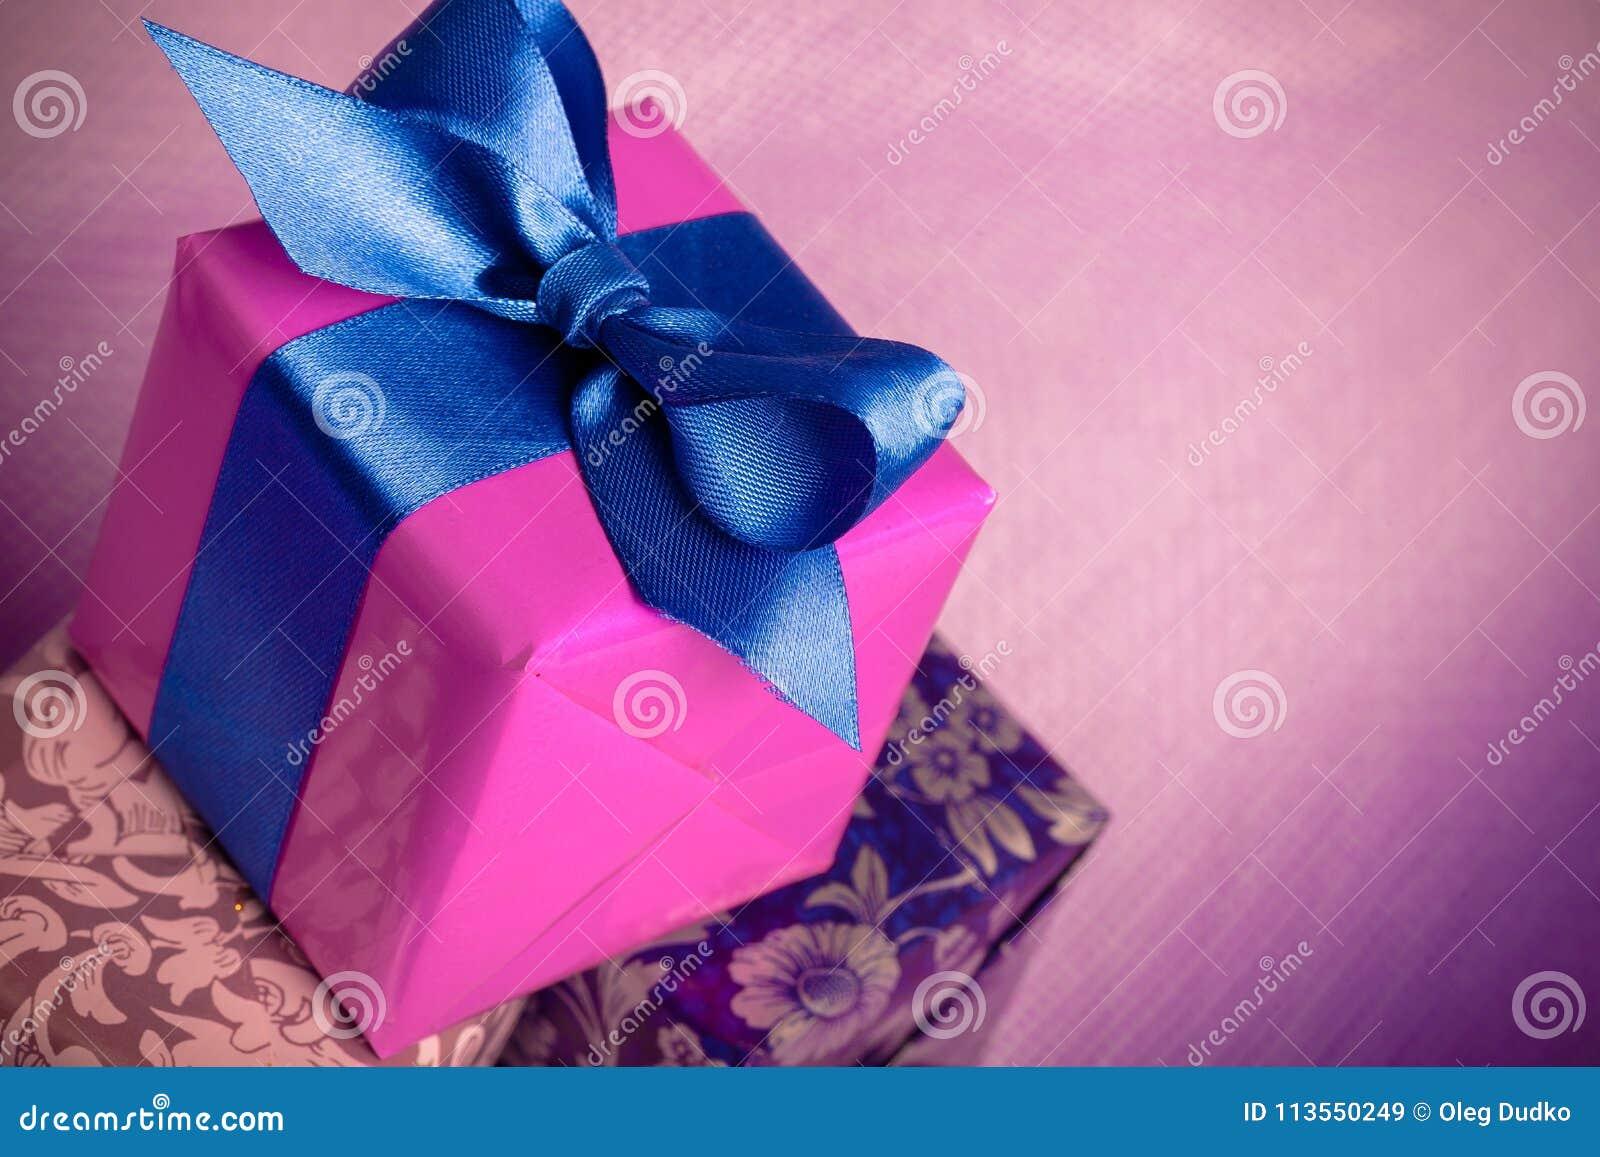 Gift Box Present Christmas Birthday